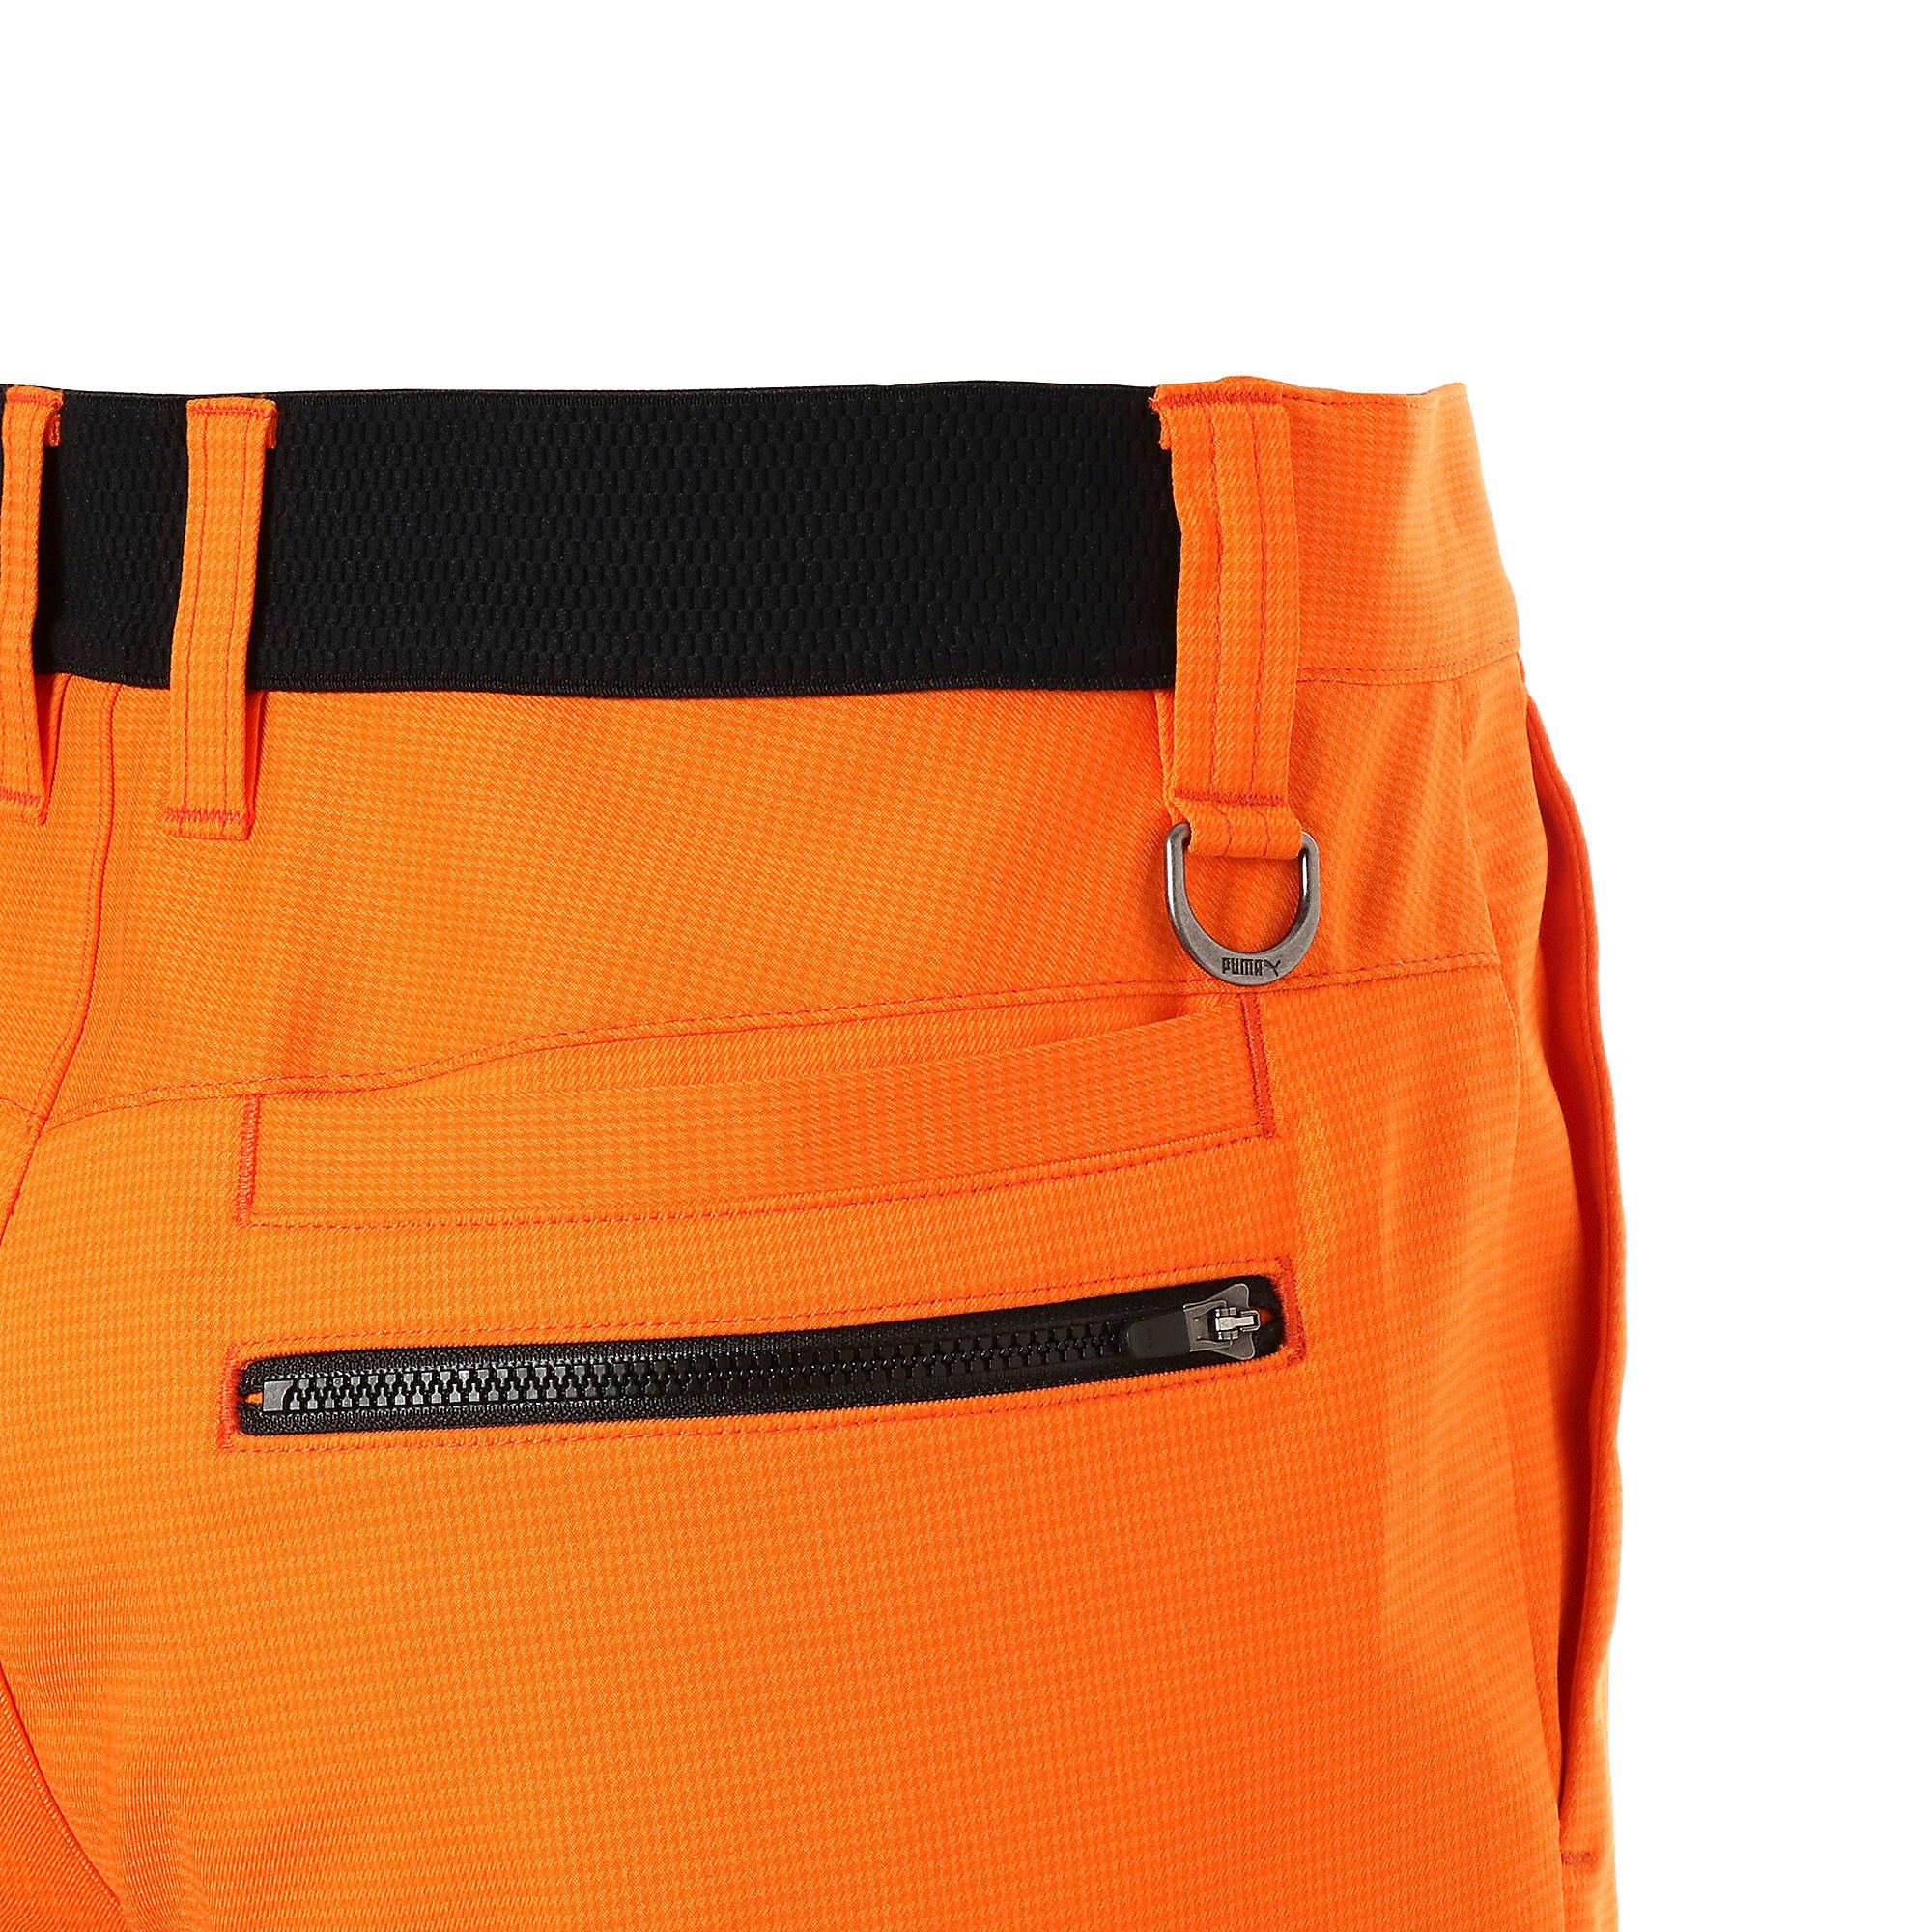 Thumbnail 8 of ゴルフ フュージョン 3Dテーパードパンツ, Vibrant Orange, medium-JPN